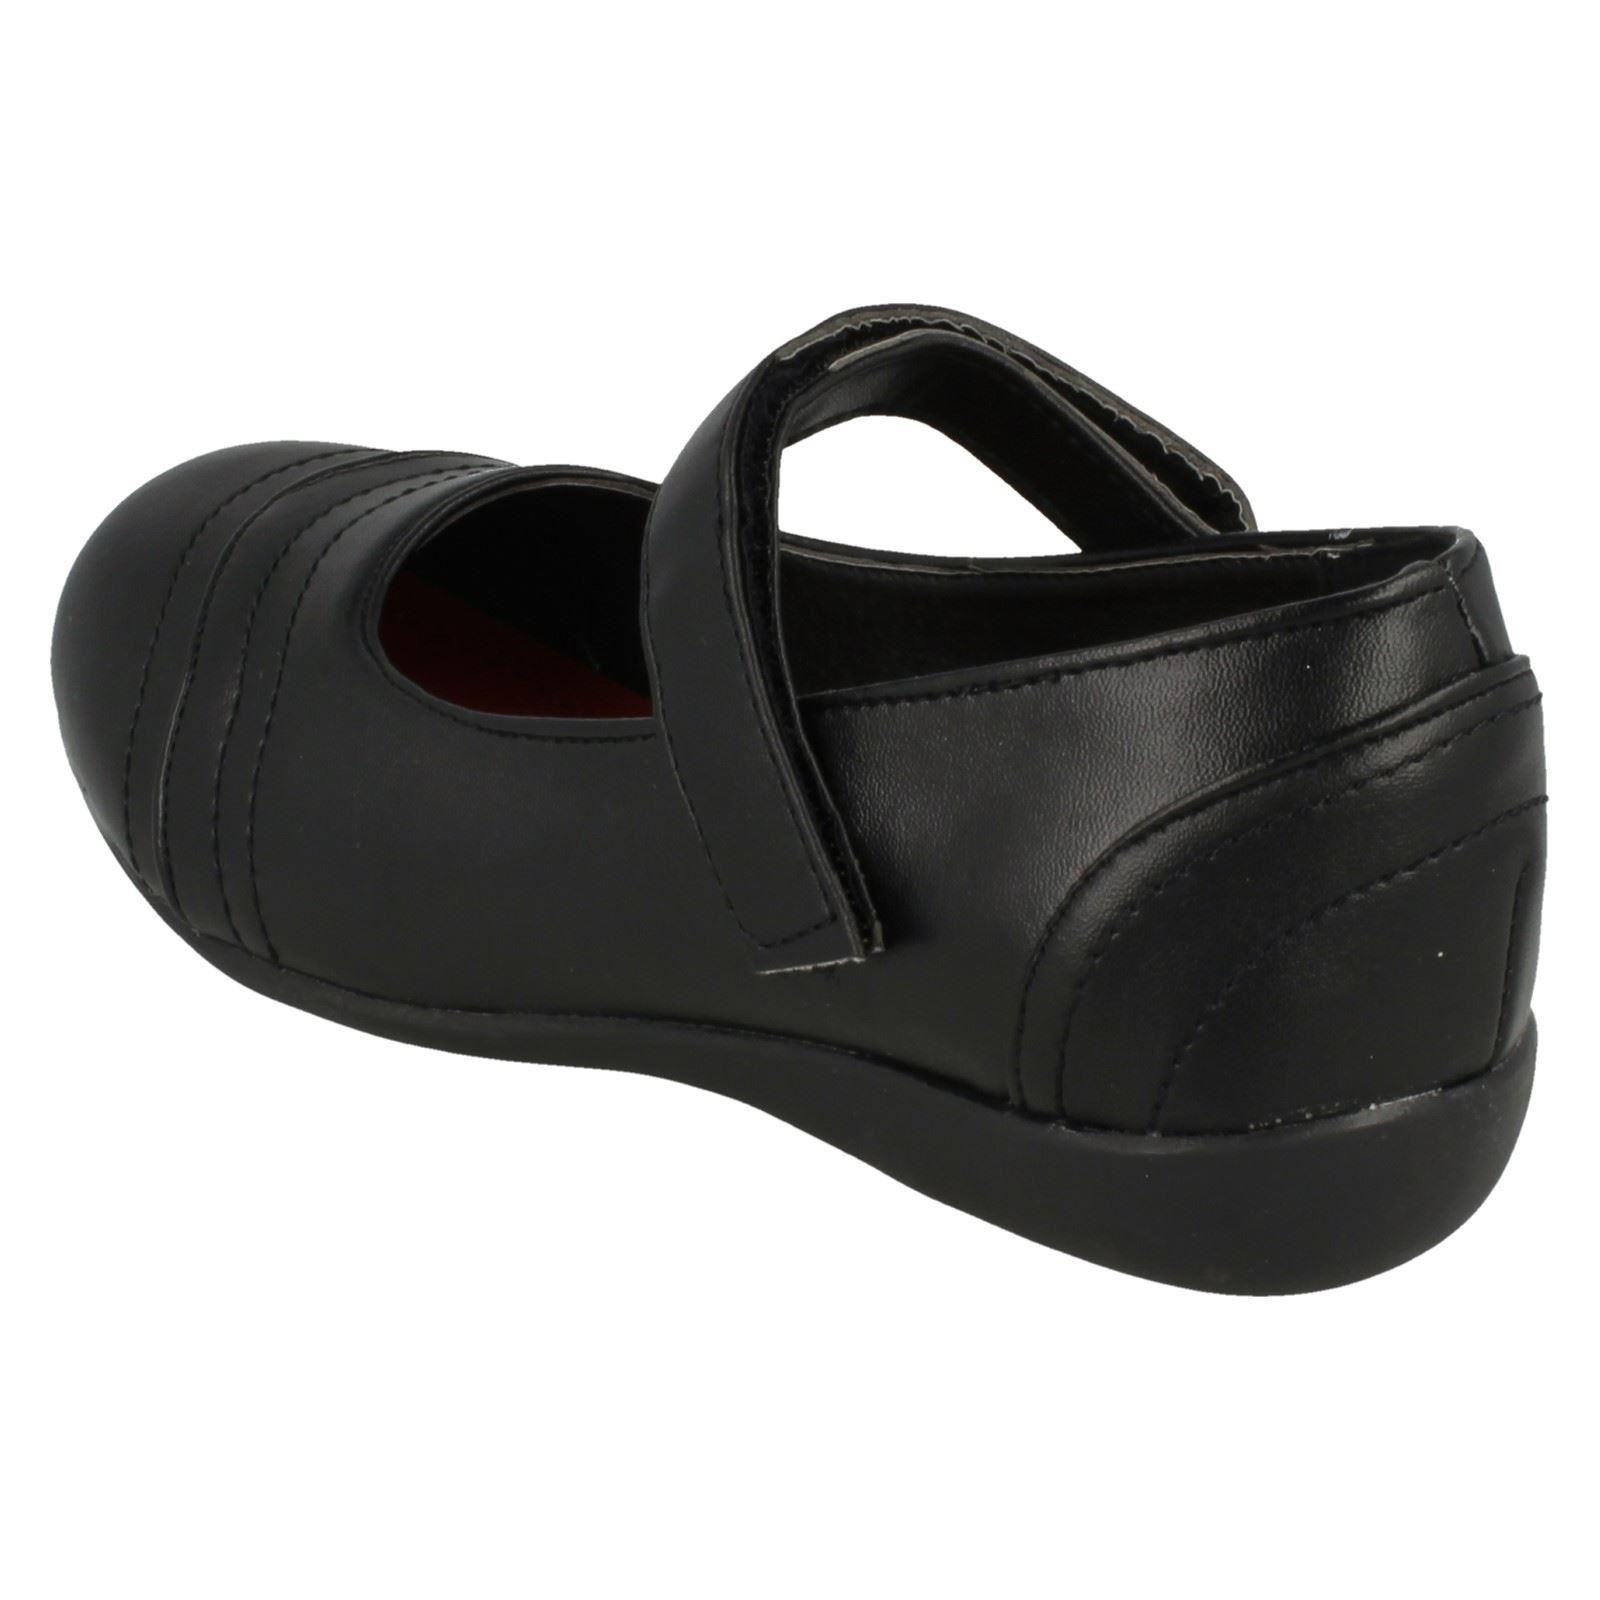 Niñas Punto en Negro Zapatos De Escuela sintético estilo H2278 ~ K